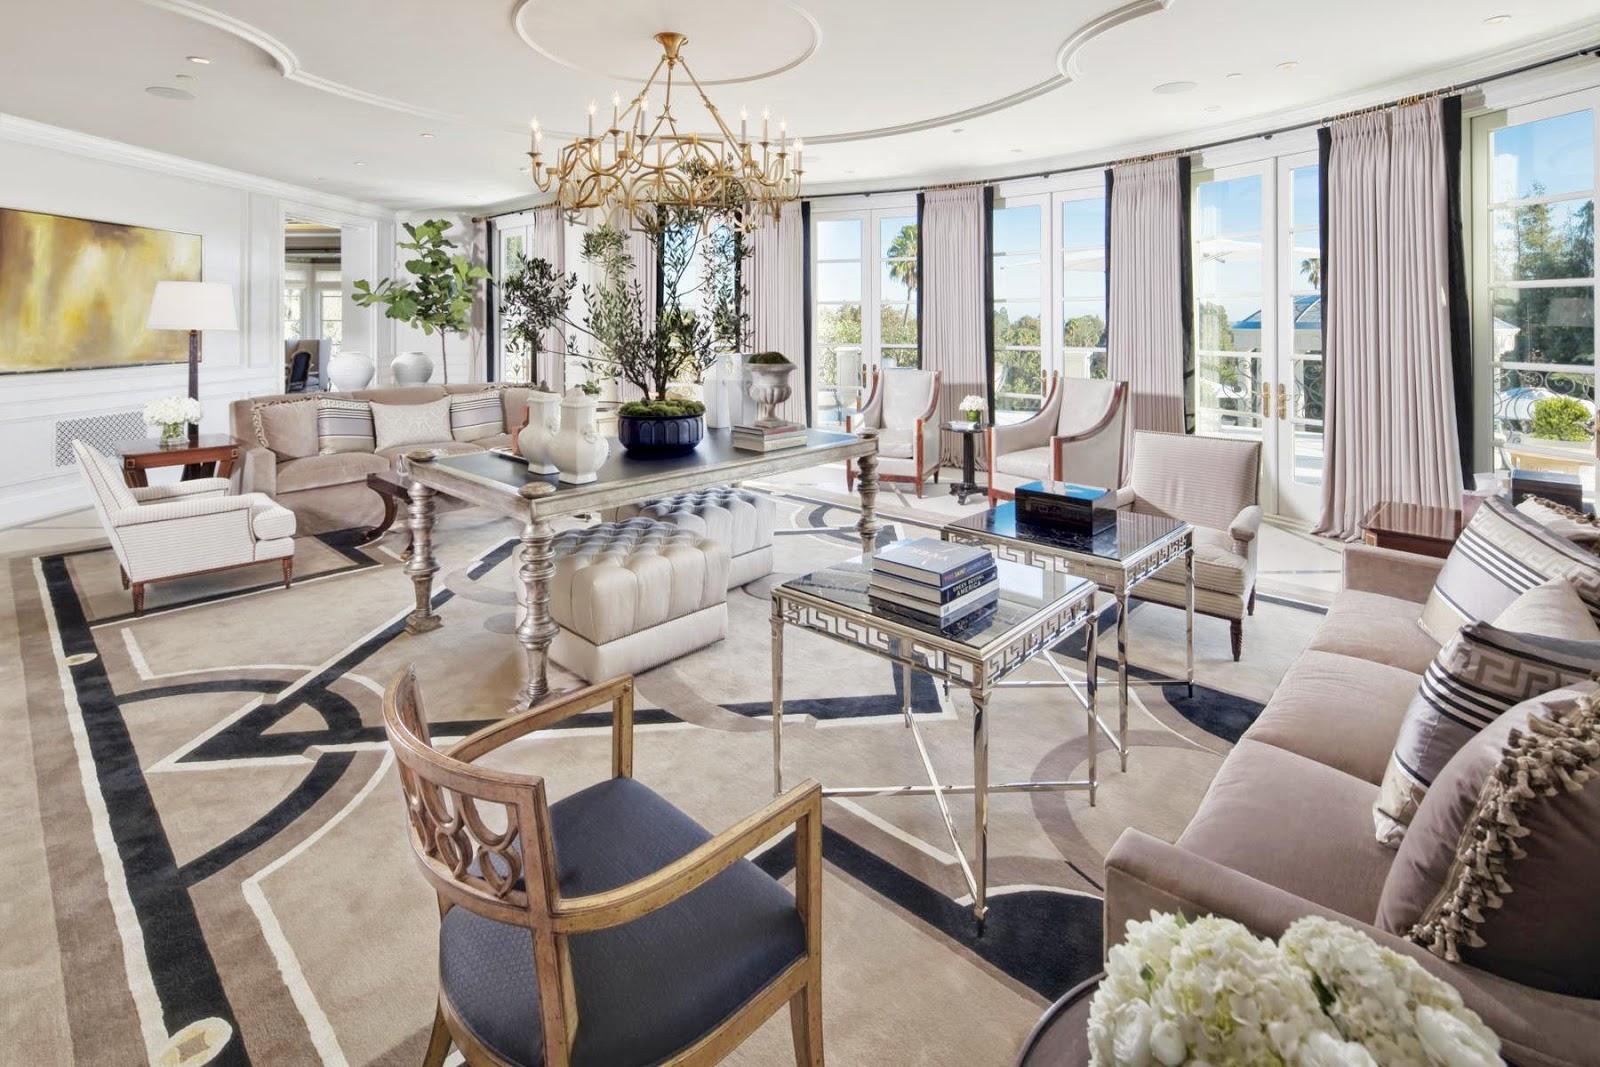 Million Dollar Living Rooms - Bing images